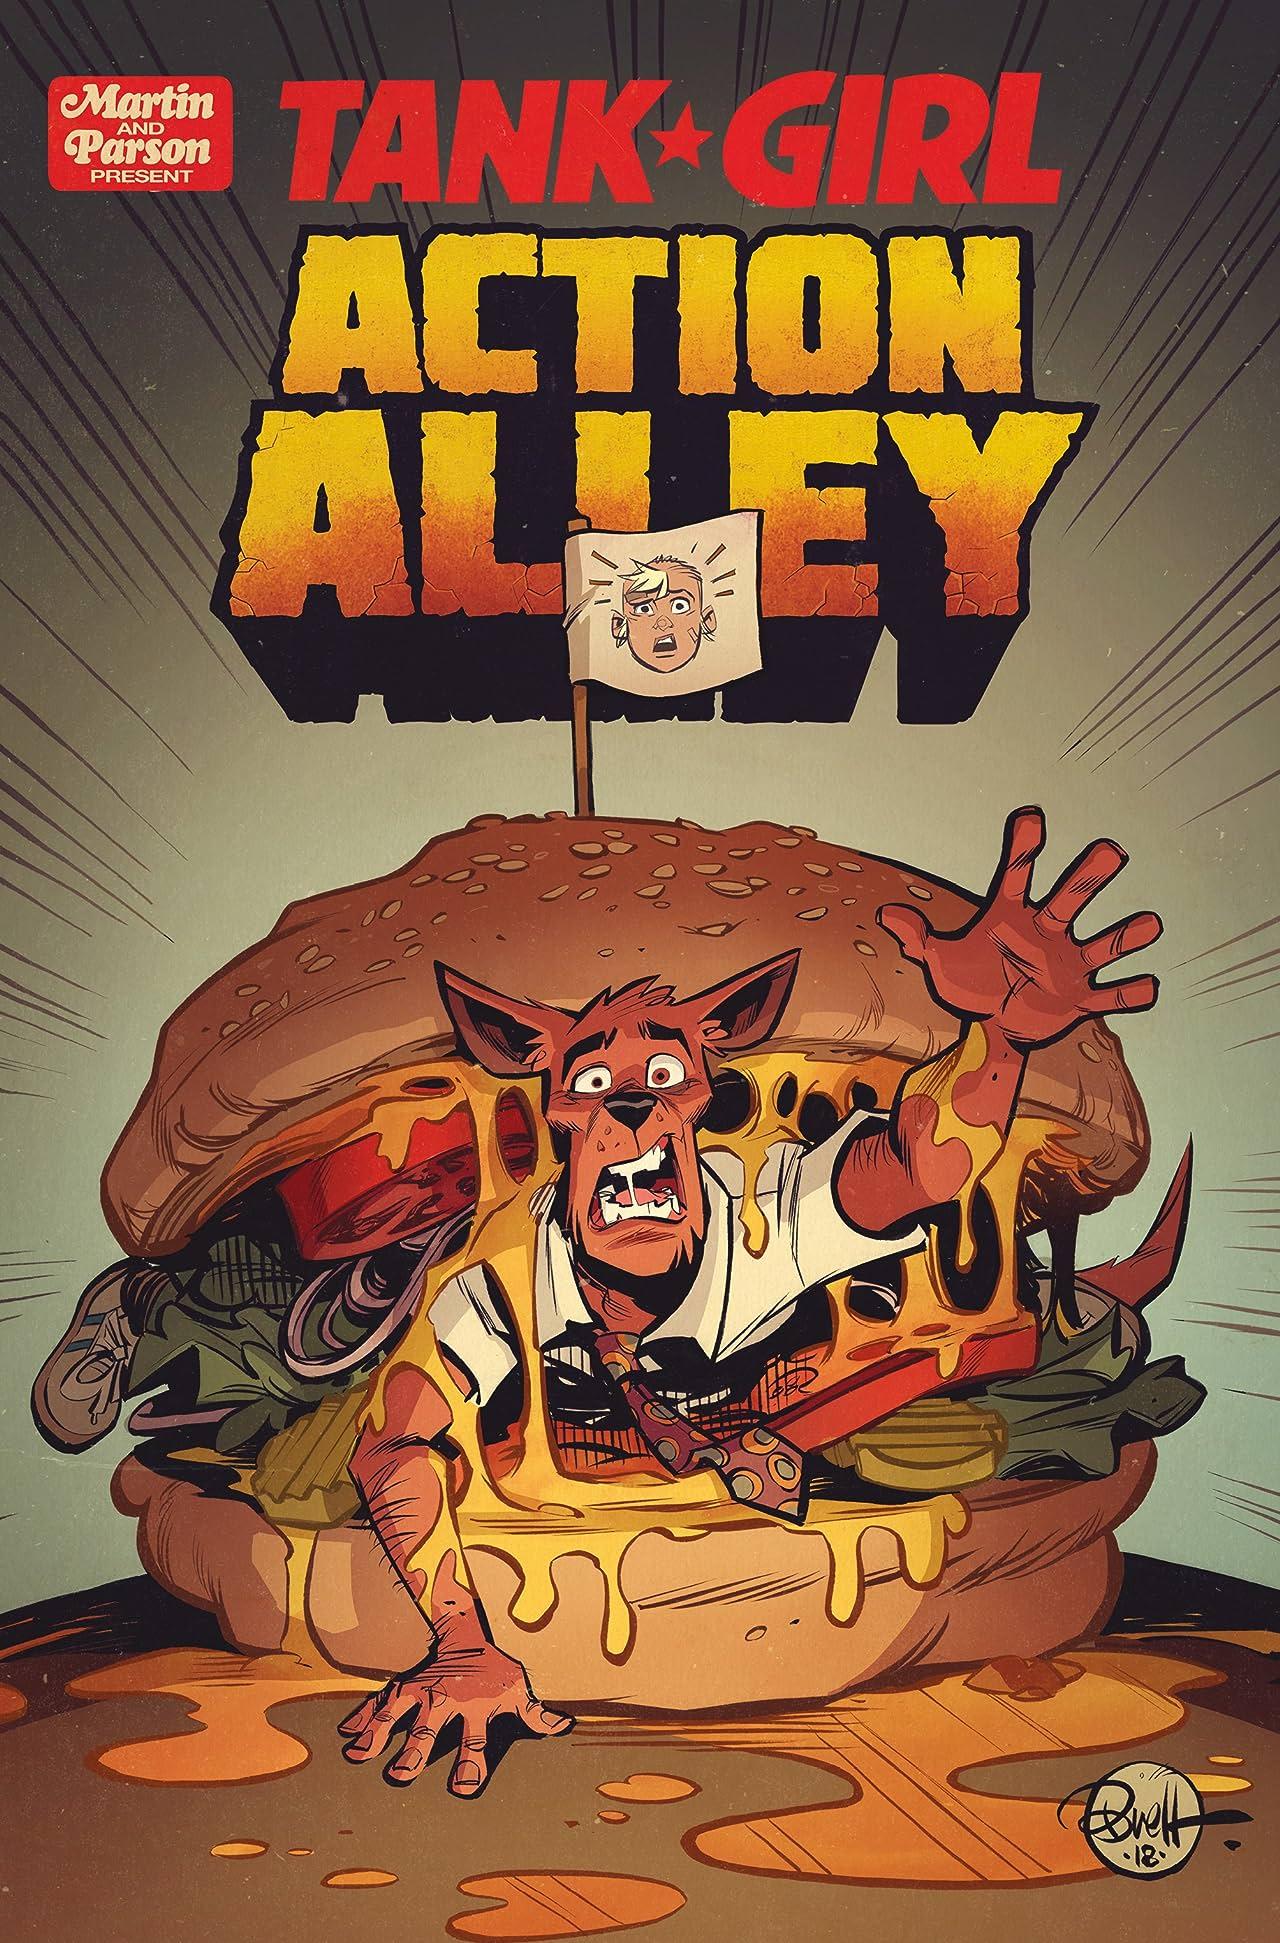 Tank Girl: Action Alley No.4